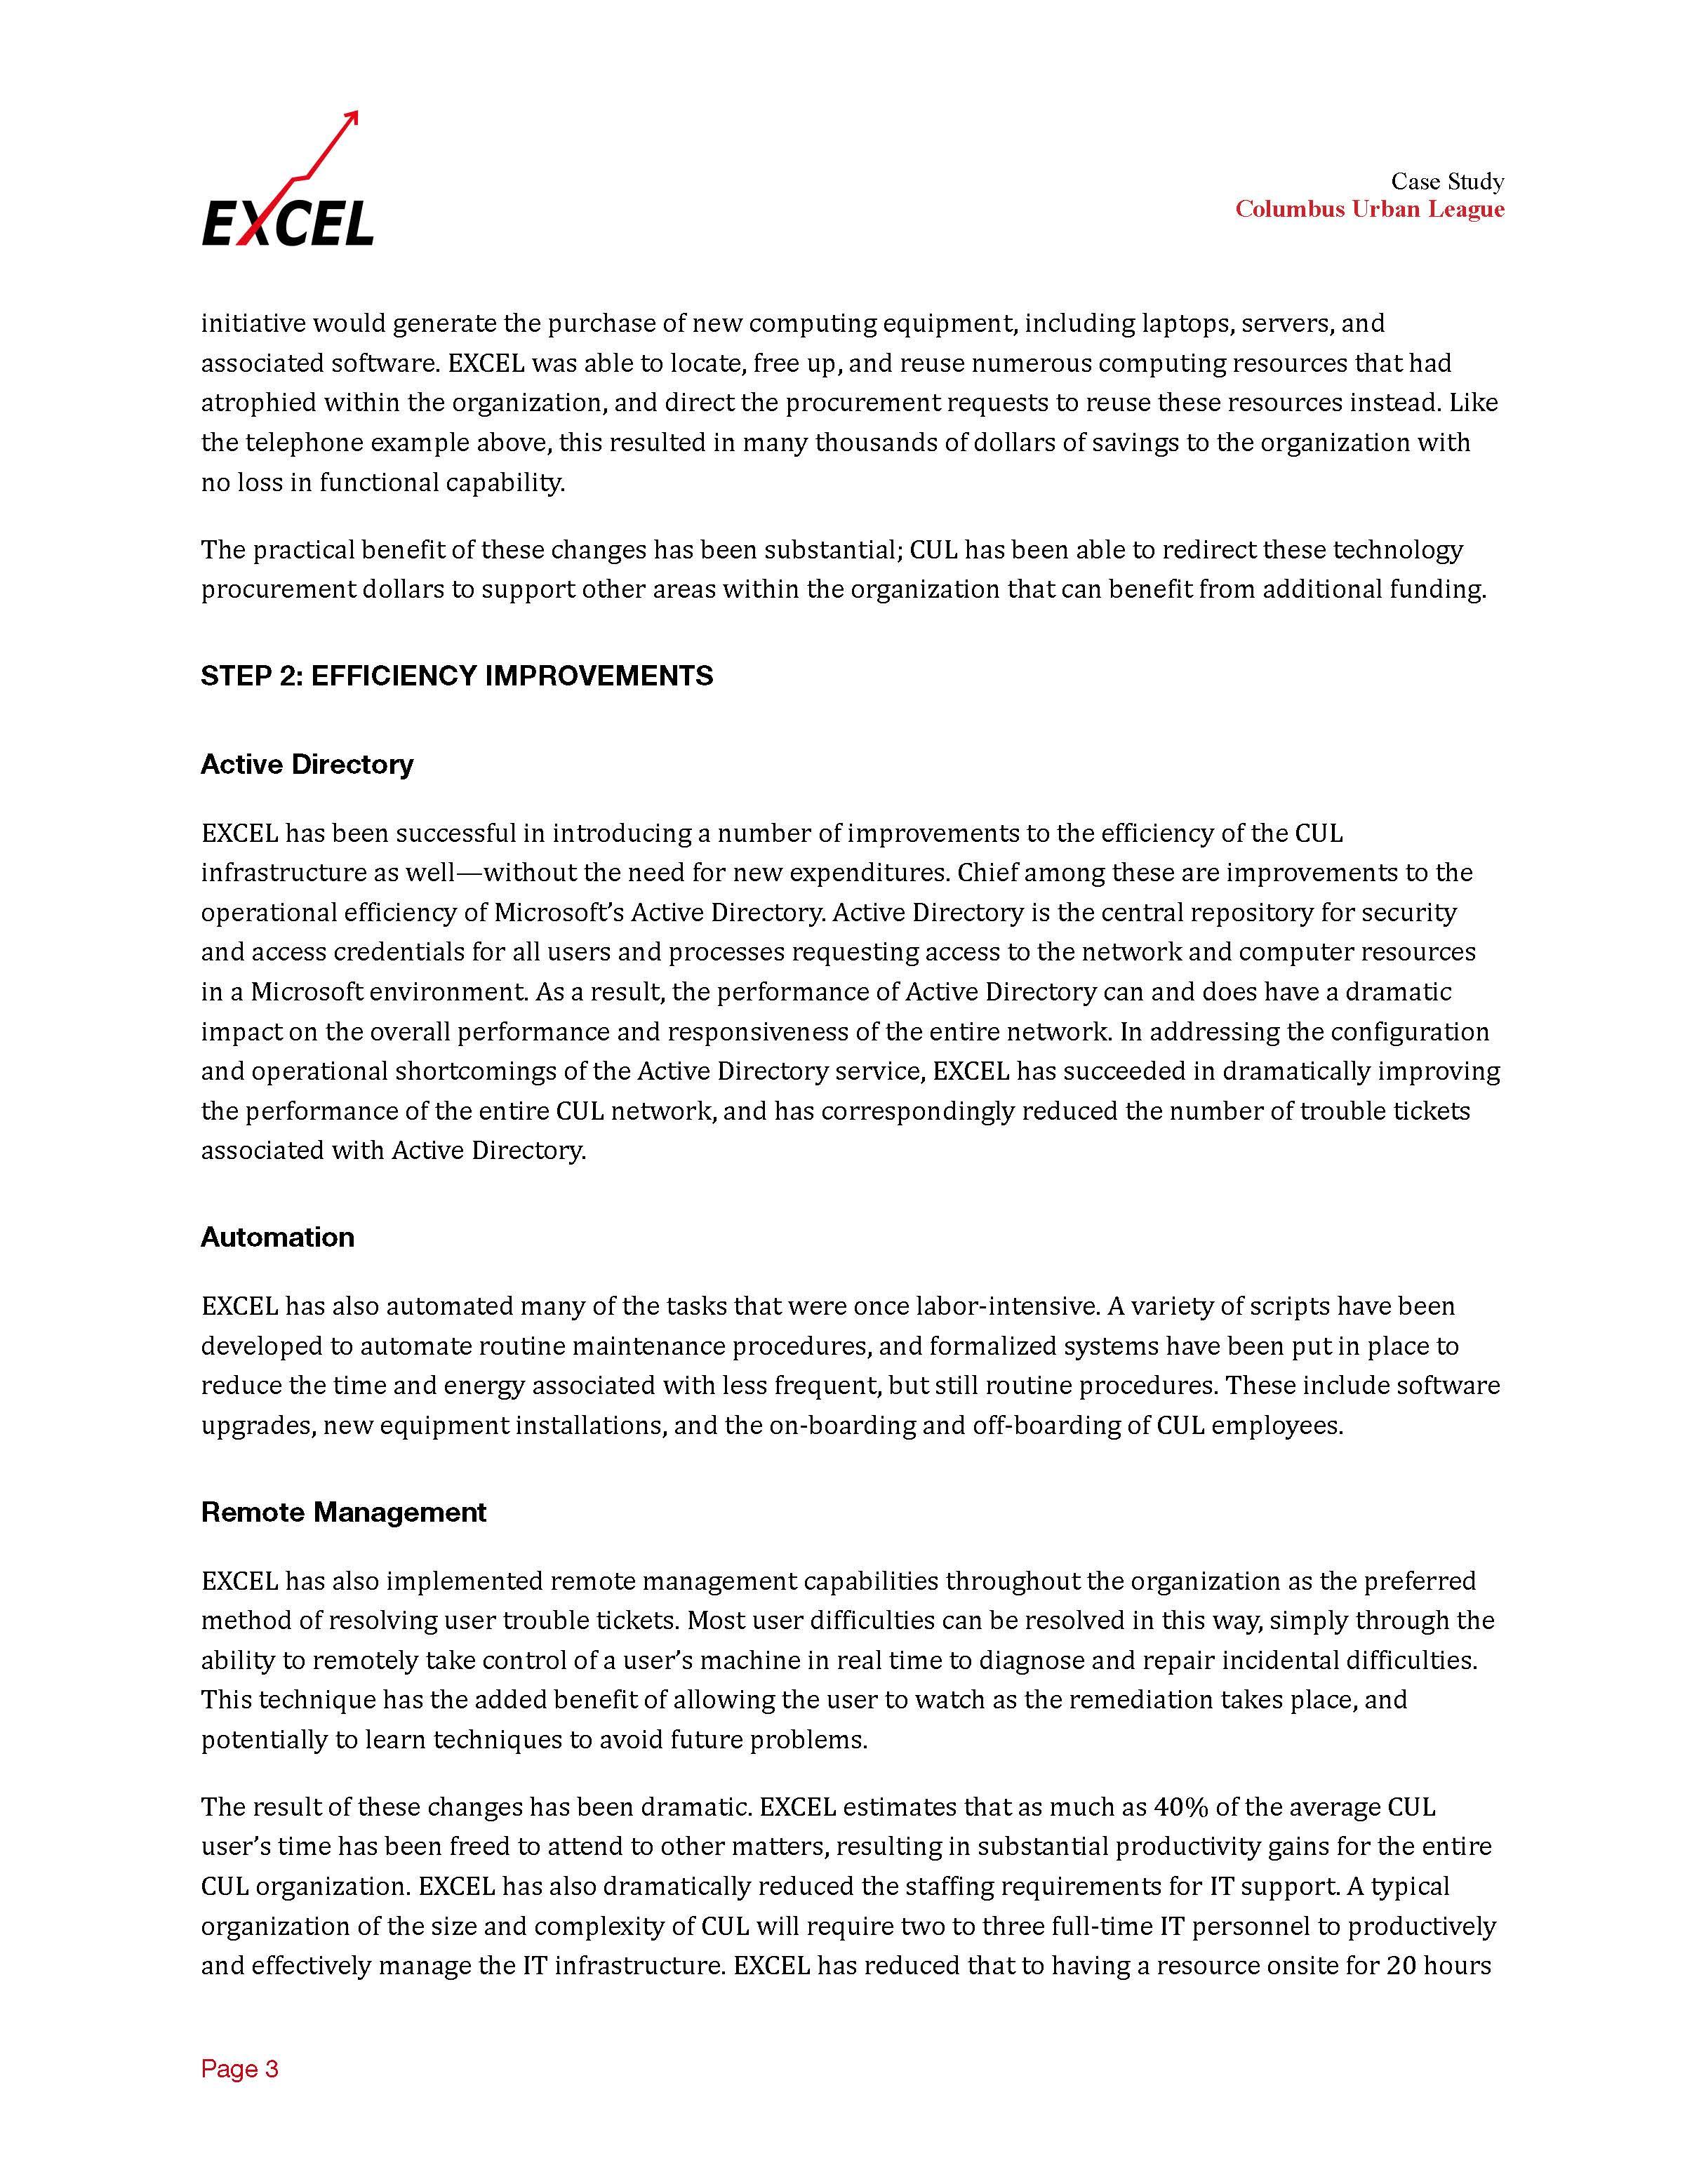 Case Study - CUL v3_Page_3.jpg